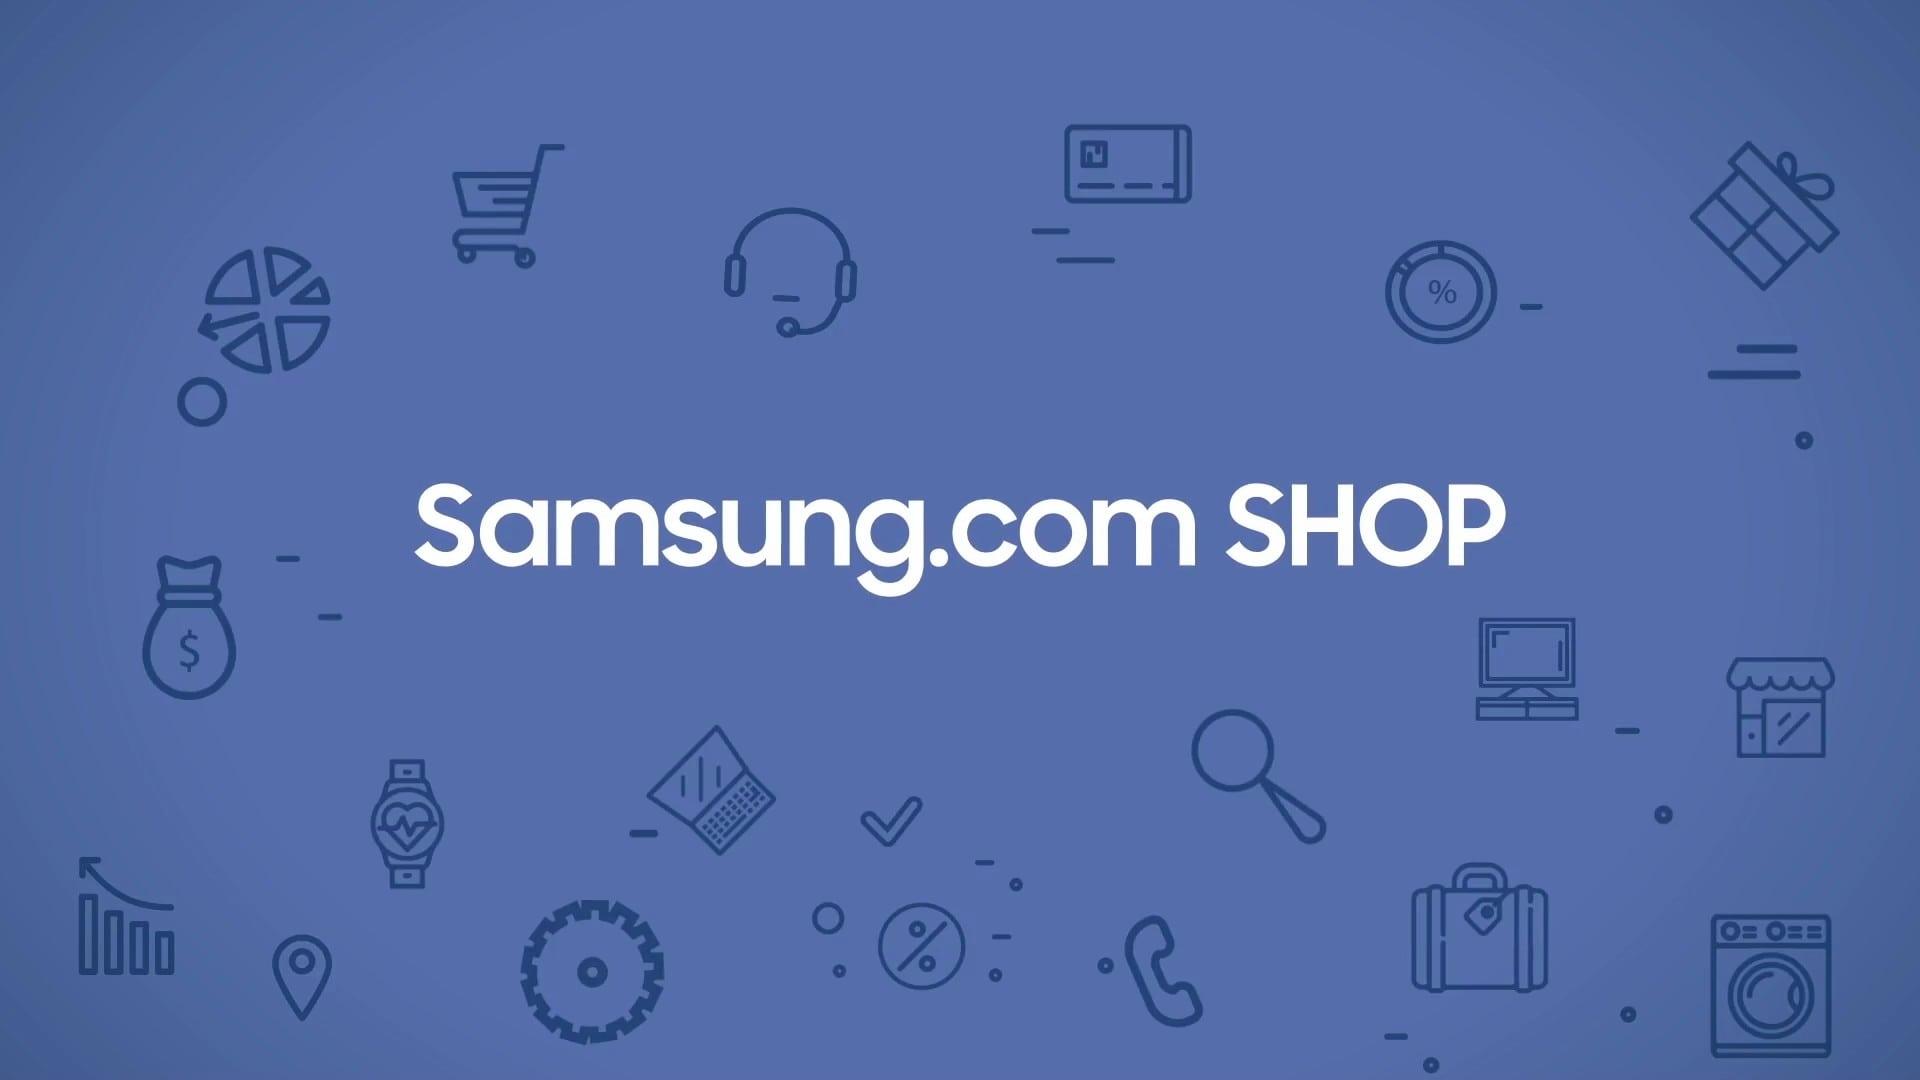 Samsung Shop motion graphic